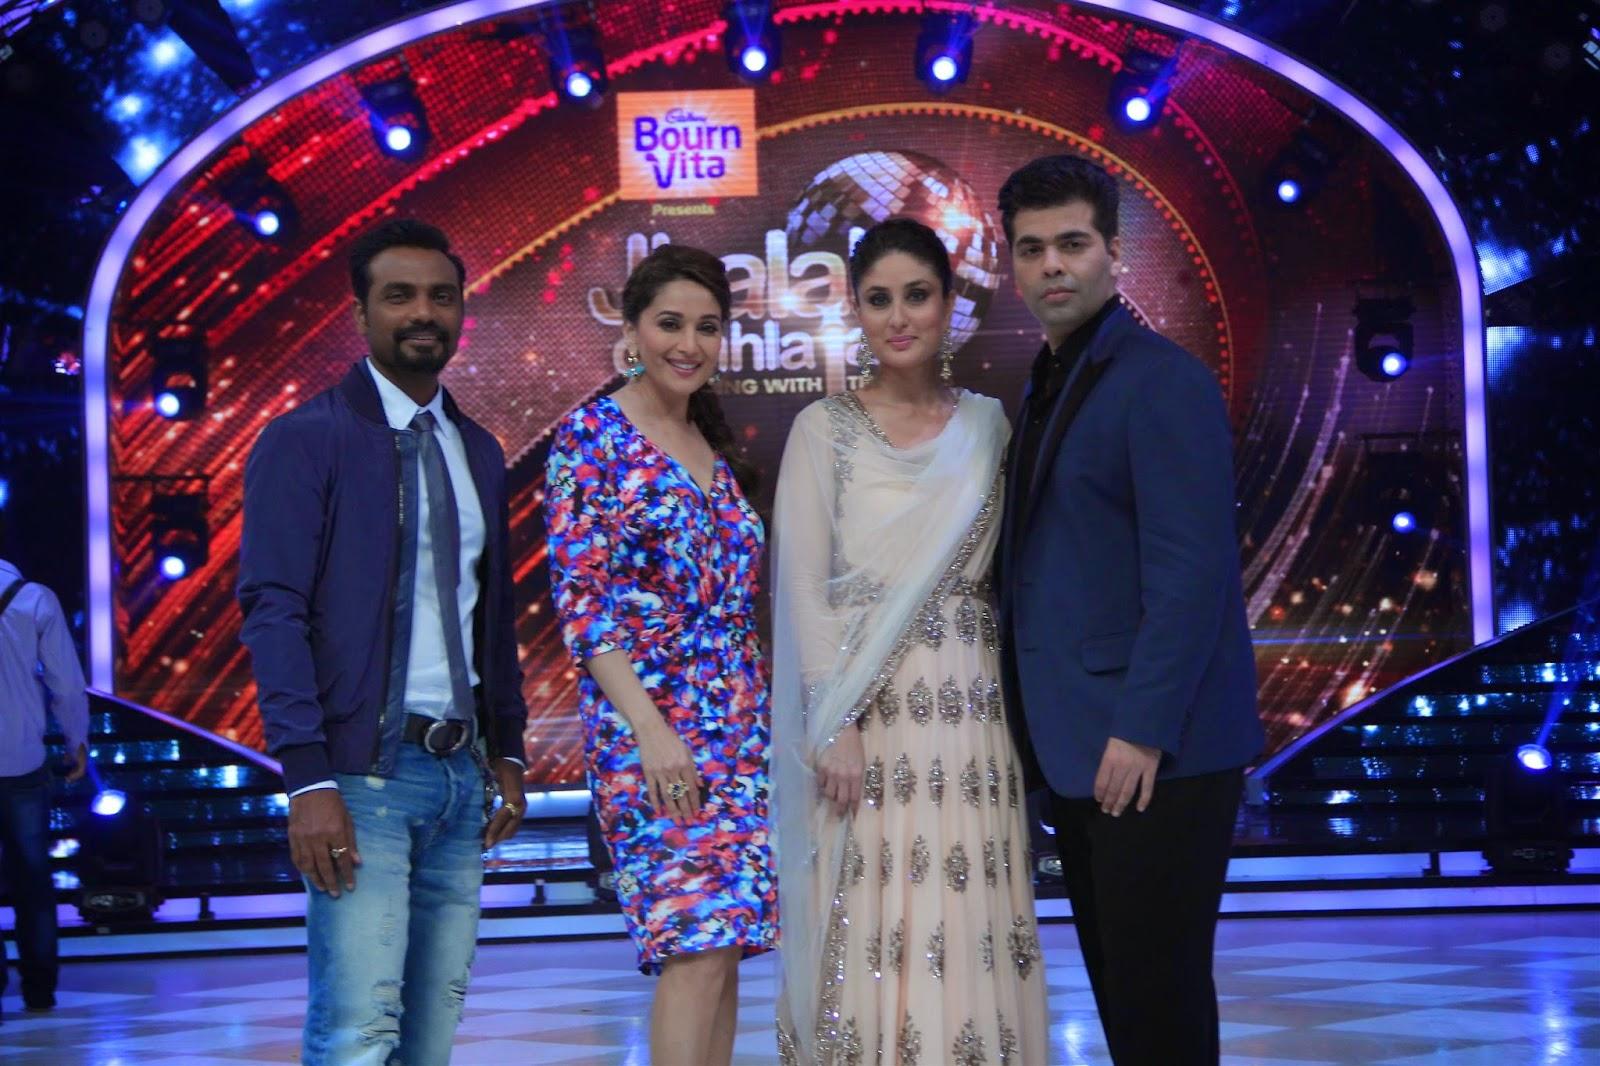 http://1.bp.blogspot.com/-qoR4yf9yC5c/U9jSUHNMcPI/AAAAAAABwCg/sOBKjdORA_A/s1600/Bollywood+Actress+Kareena+Kapoor+Promotes+her+upcoming+movie+%27Singham+Returns%27+On+Jhalak+Dikhhla+Jaa+7+gallery.+(2).JPG